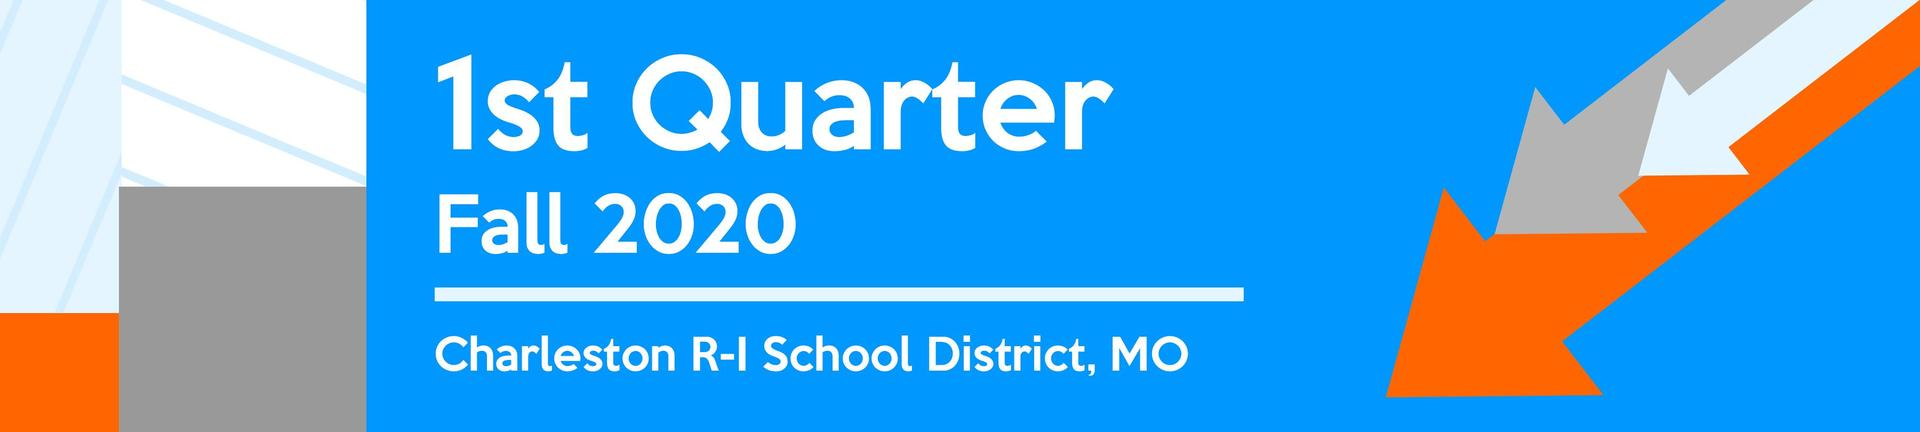 1st Quarter Fall 2020 - Charleston R-I School District, MO